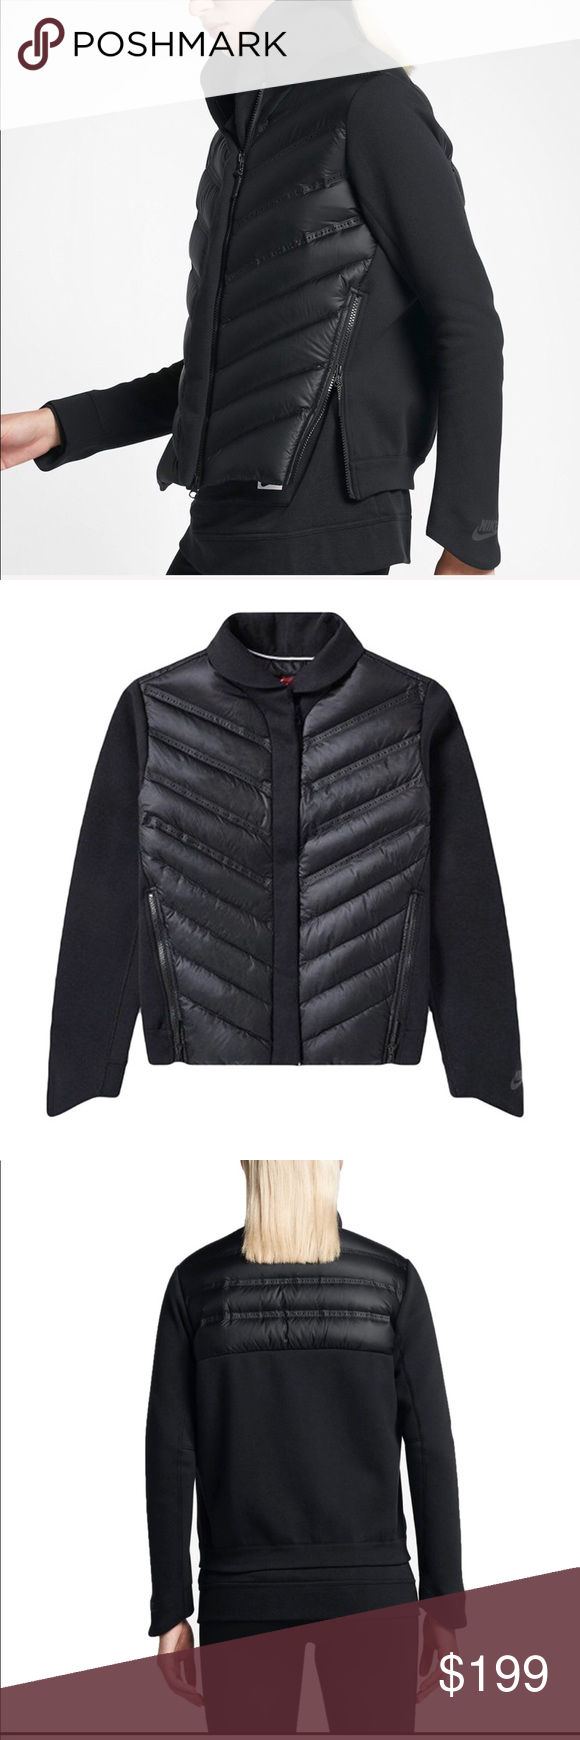 4462099a7 Nike NWT Tech Fleece Aero Loft Bomber Jacket •Details• This Jacket ...